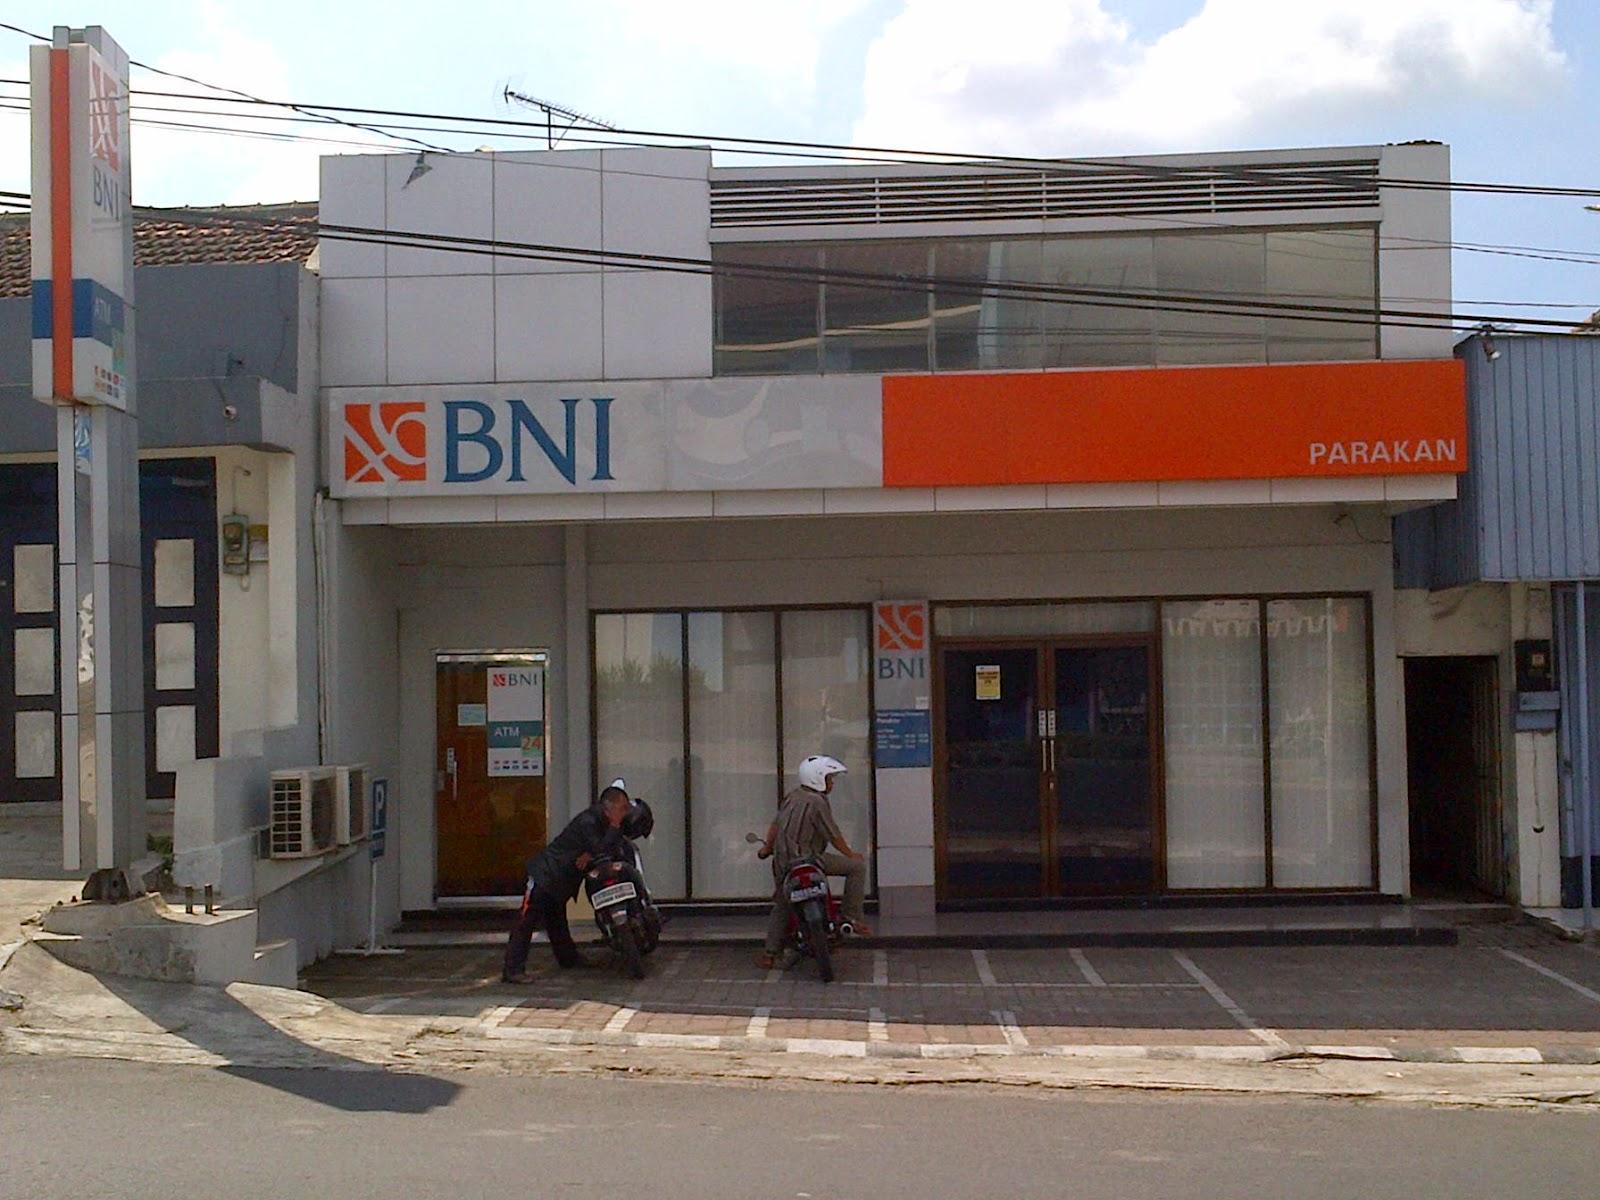 Kantor Bank BNI Cabang Parakan ~ Menoreh Post